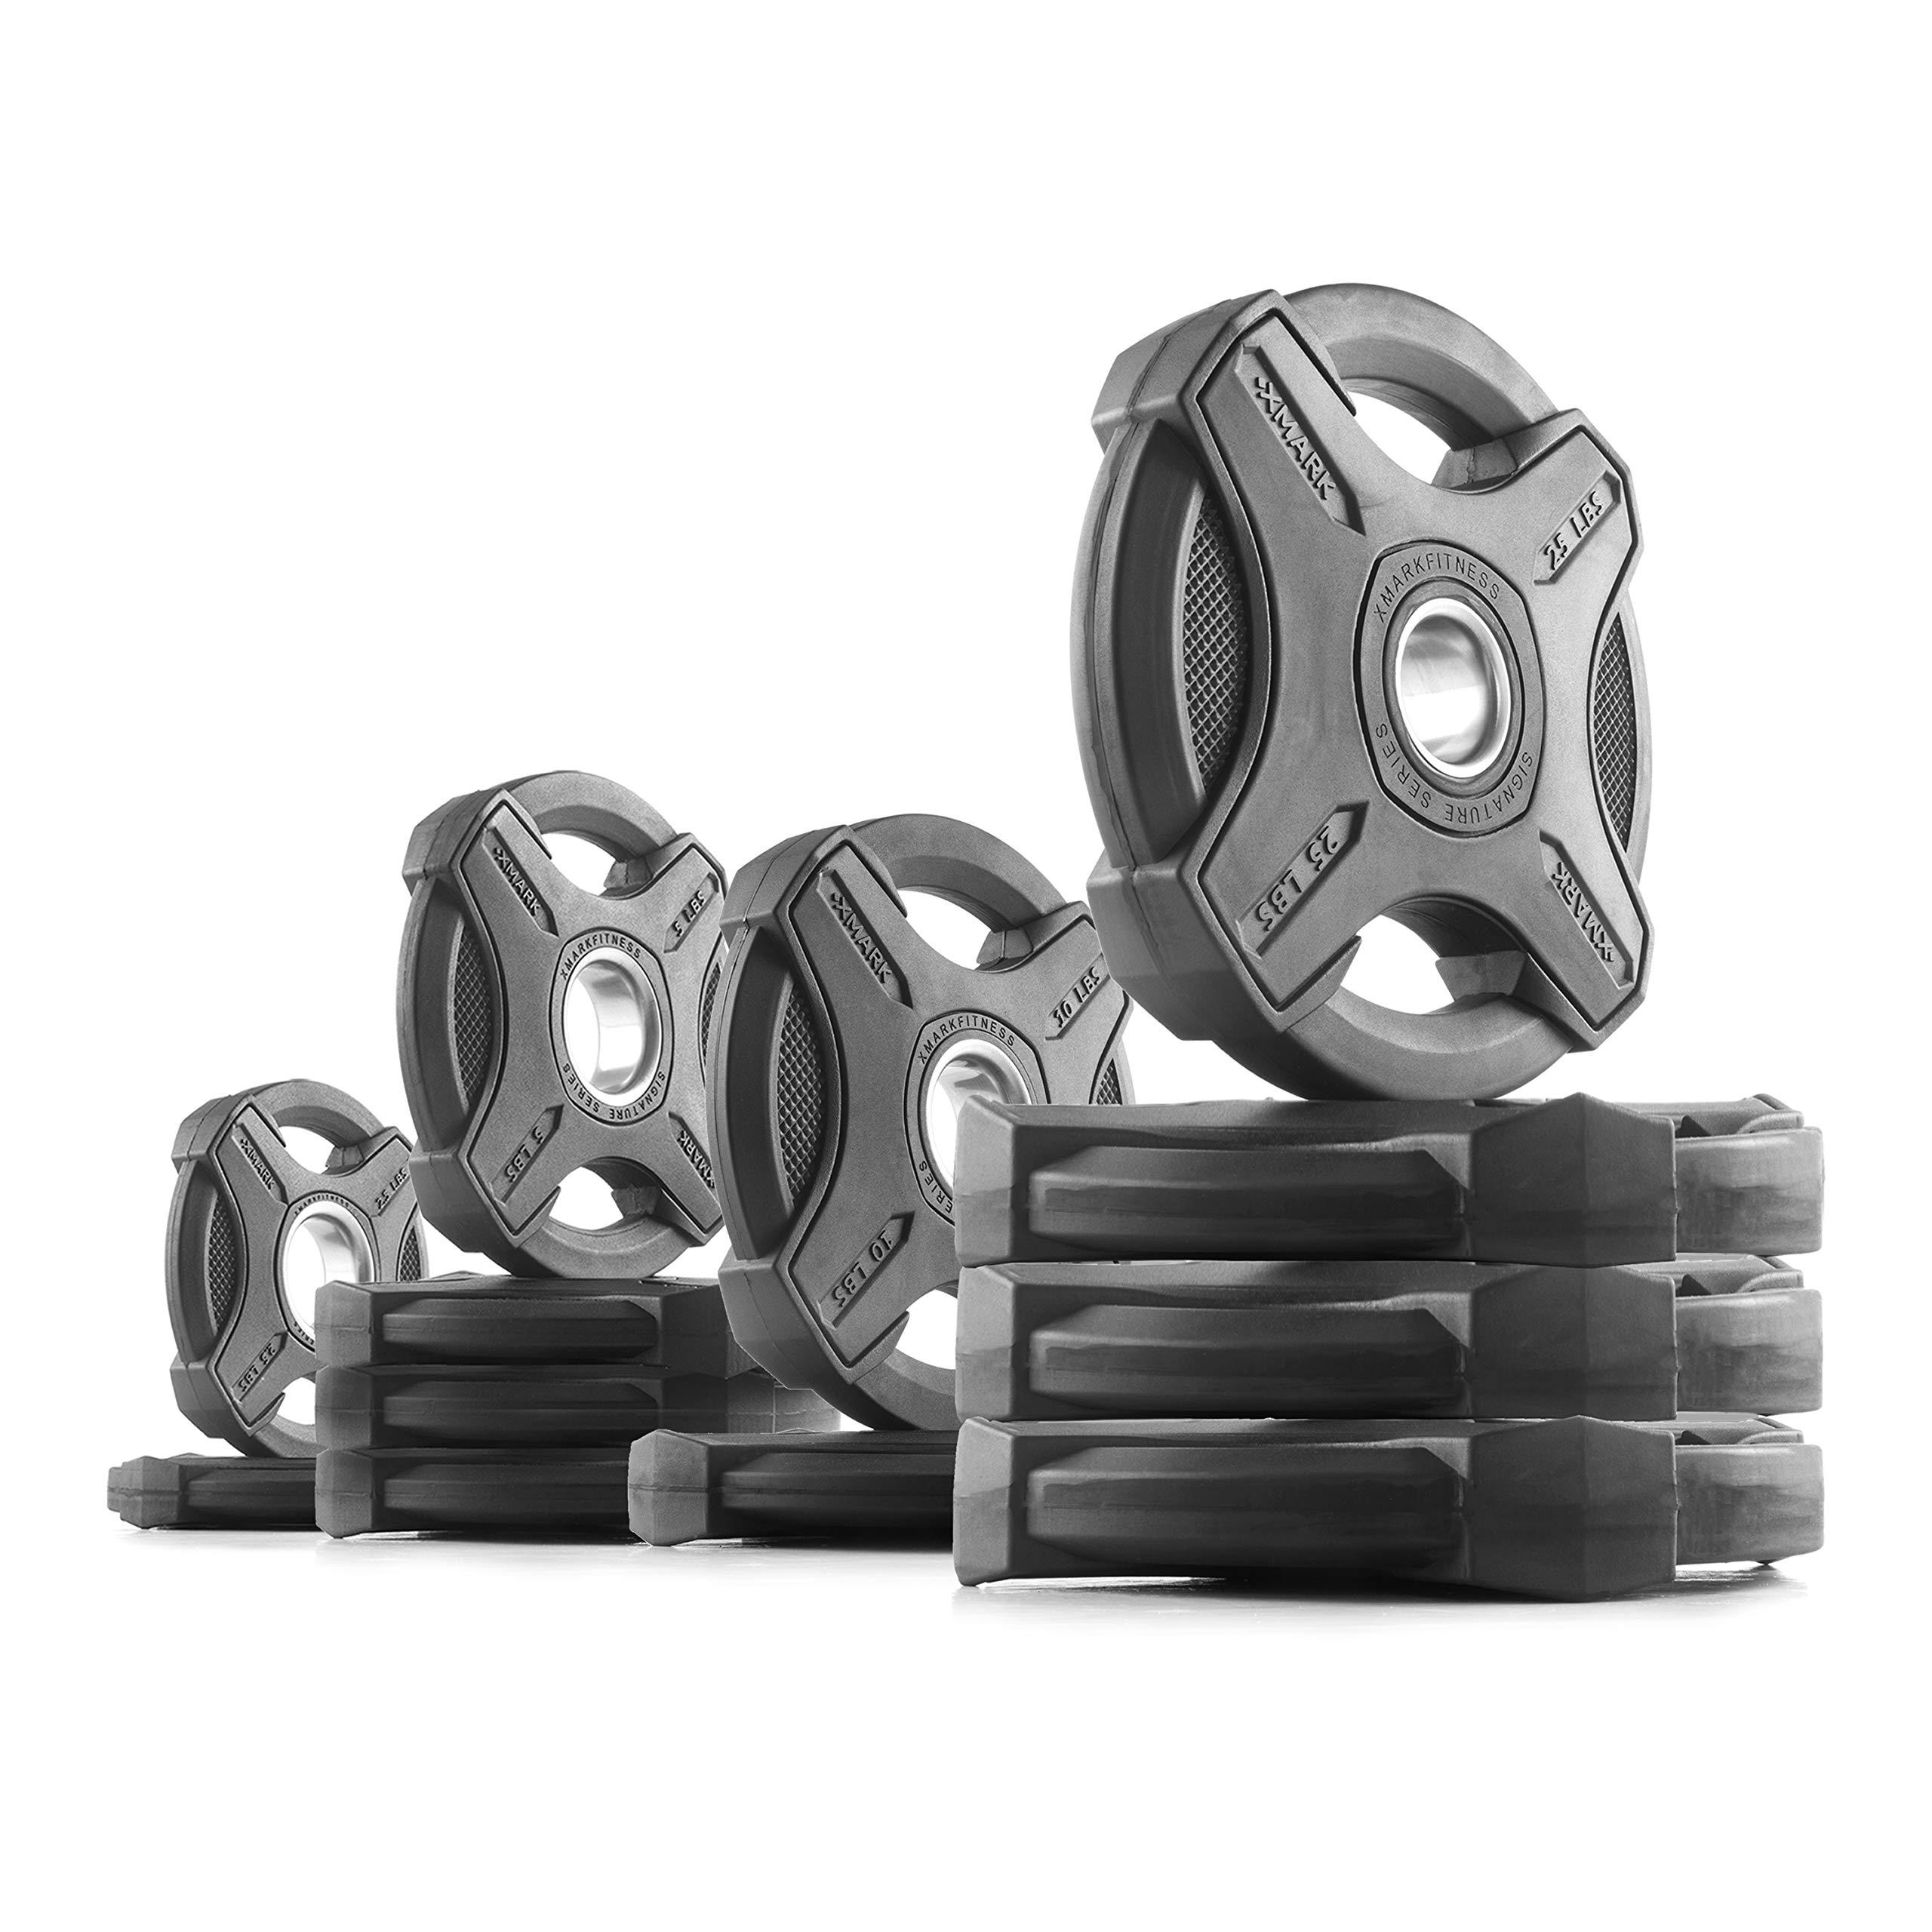 XMark 145 lb Set Signature Plates, One-Year Warranty, Olympic Weight Plates, Cutting-Edge Design